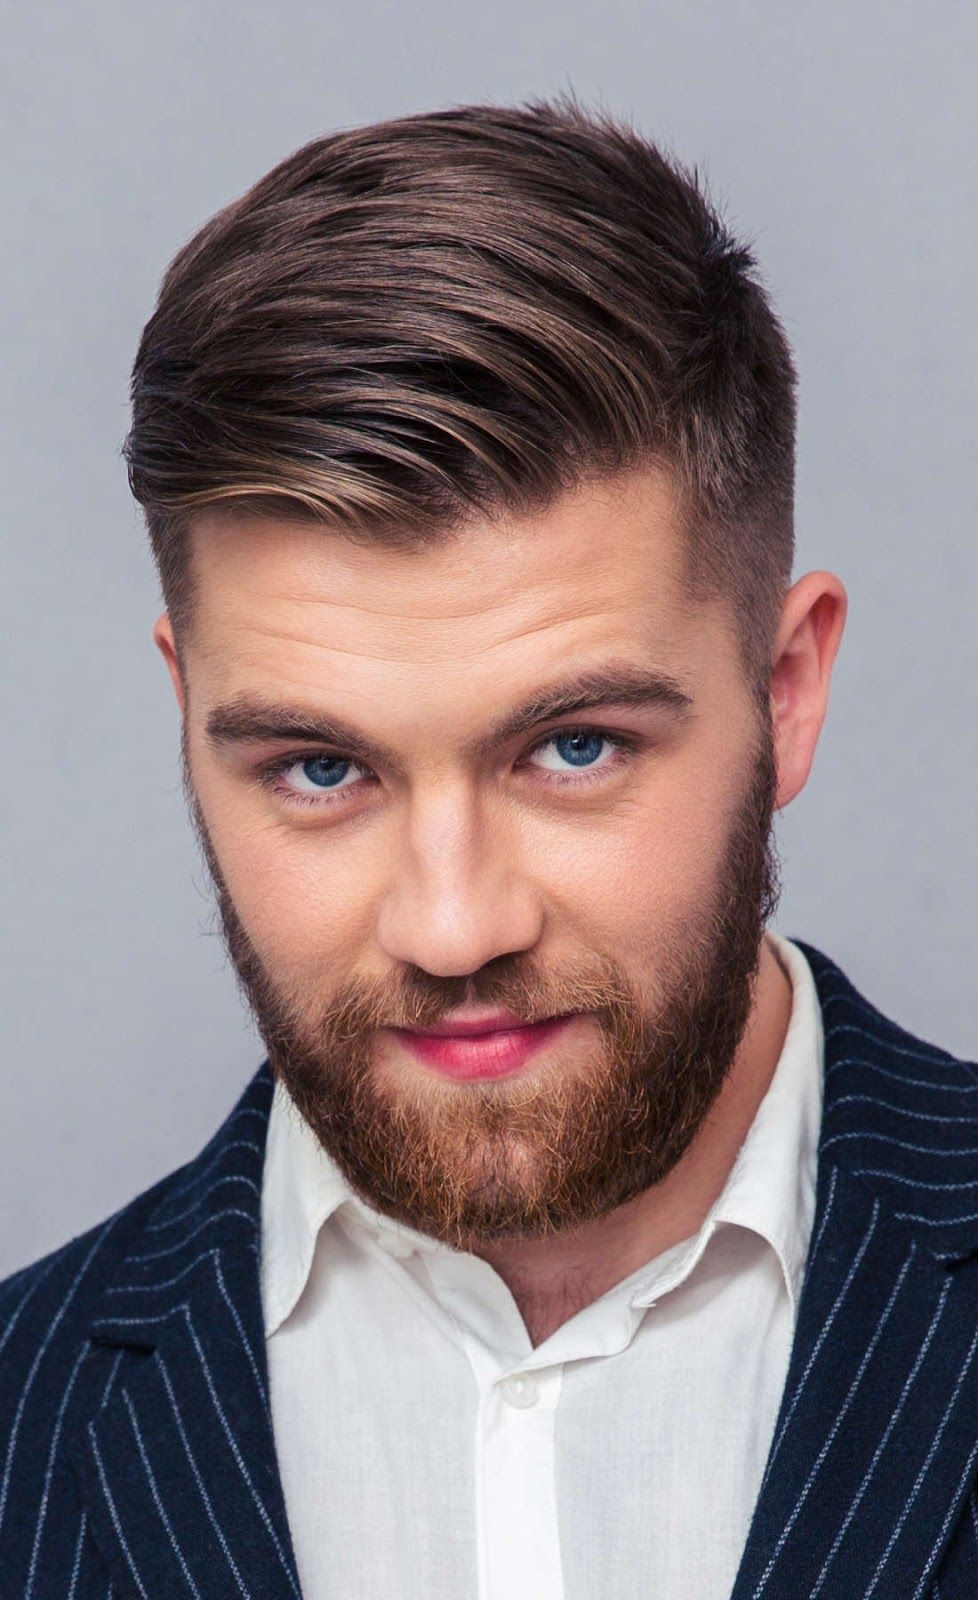 Best Formal Haircut In 2020 Mens Haircuts Short Business Hairstyles Mens Hairstyles Short